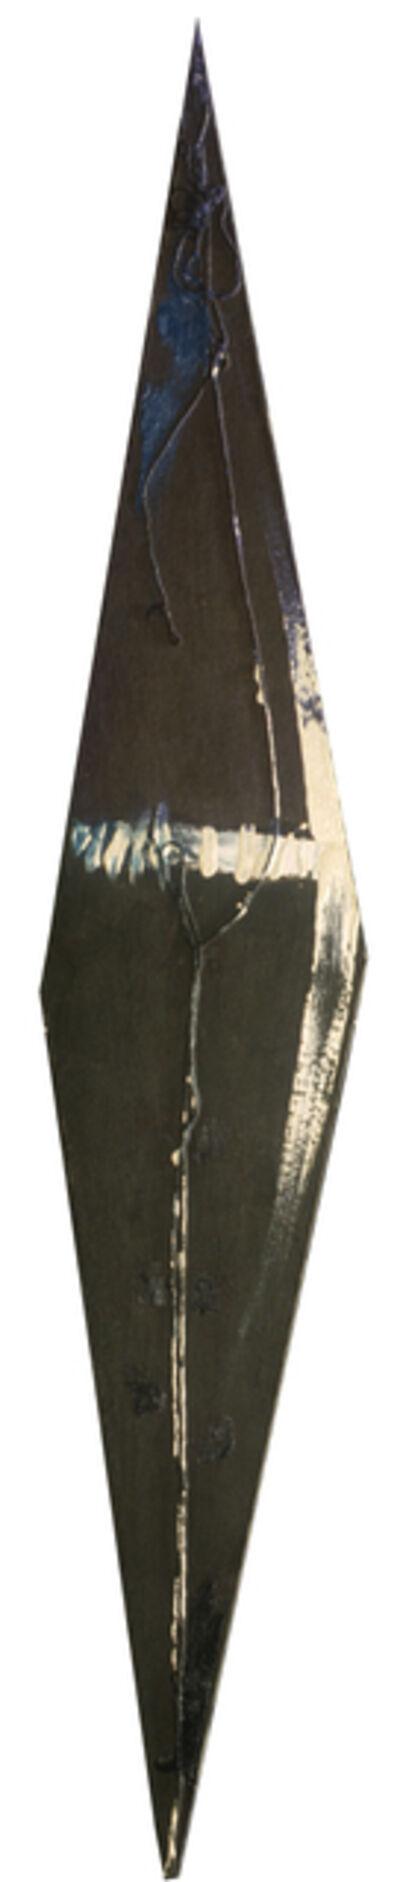 Stanley Boxer, 'Quarried Series III - 9', 1993